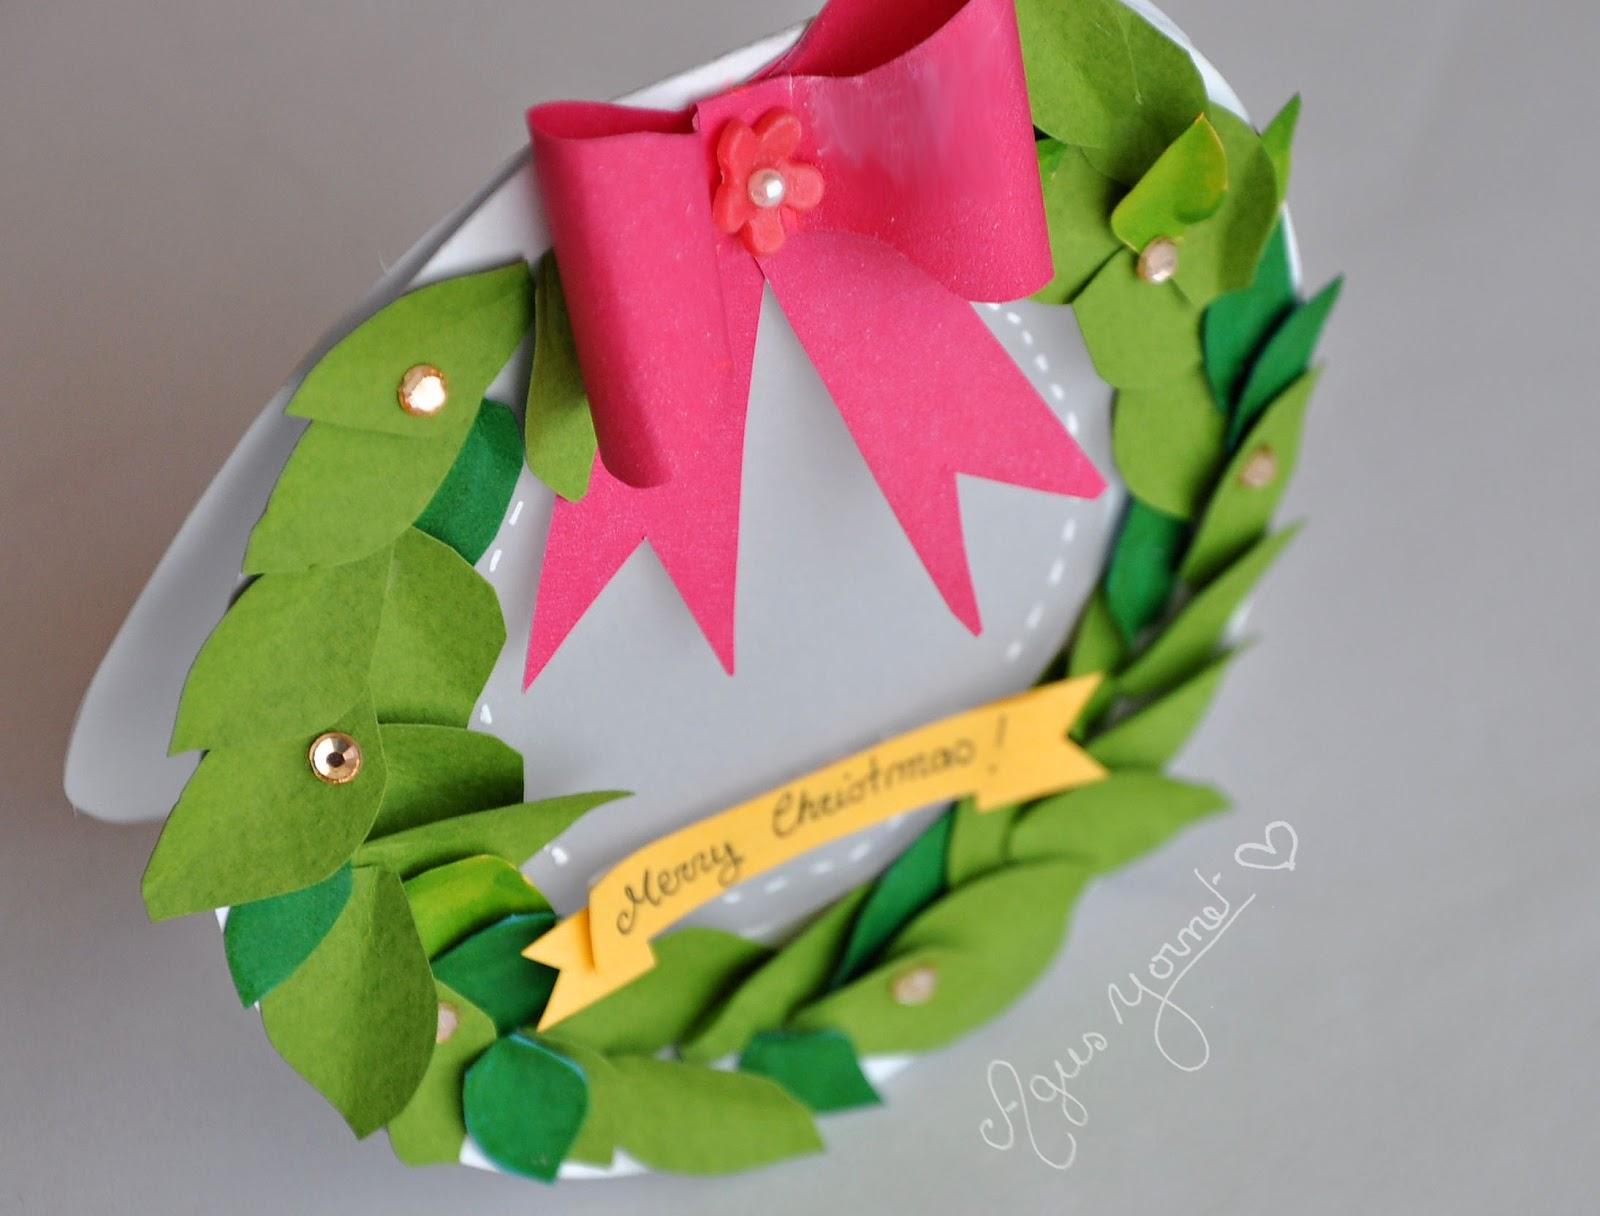 Corona Feliz Navidad feliz navidad flickr photo sharing  : coronanavidad2  from www.apexwallpapers.com size 1600 x 1216 jpeg 160kB